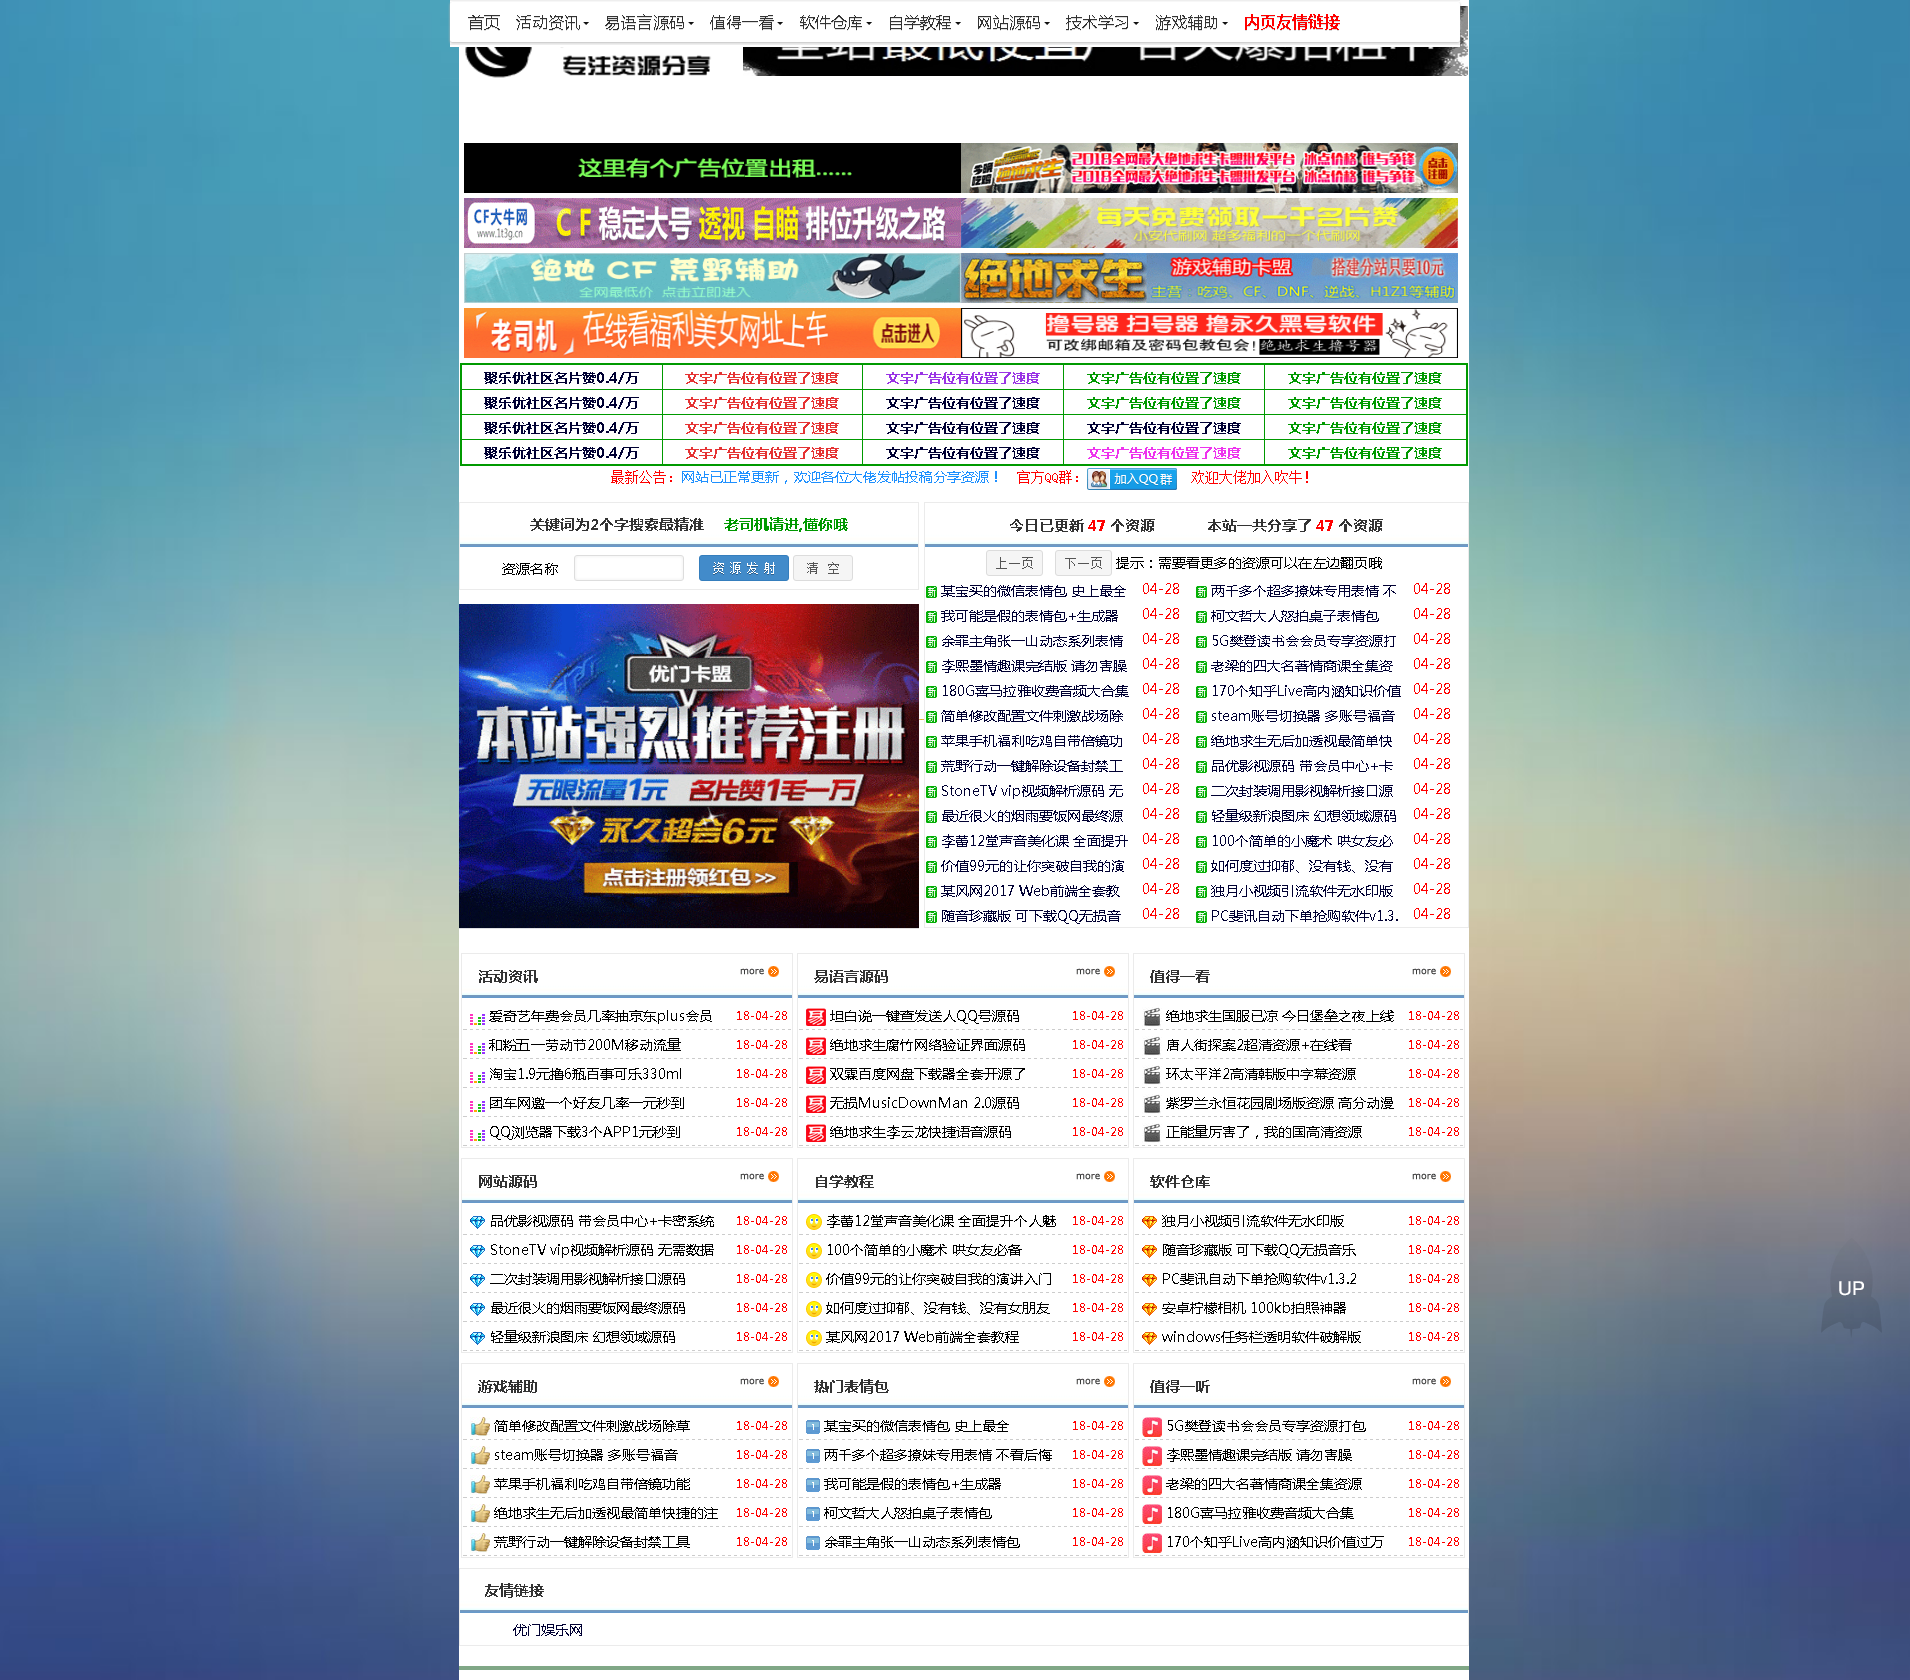 ZB博客仿小刀娱乐网自适应模板